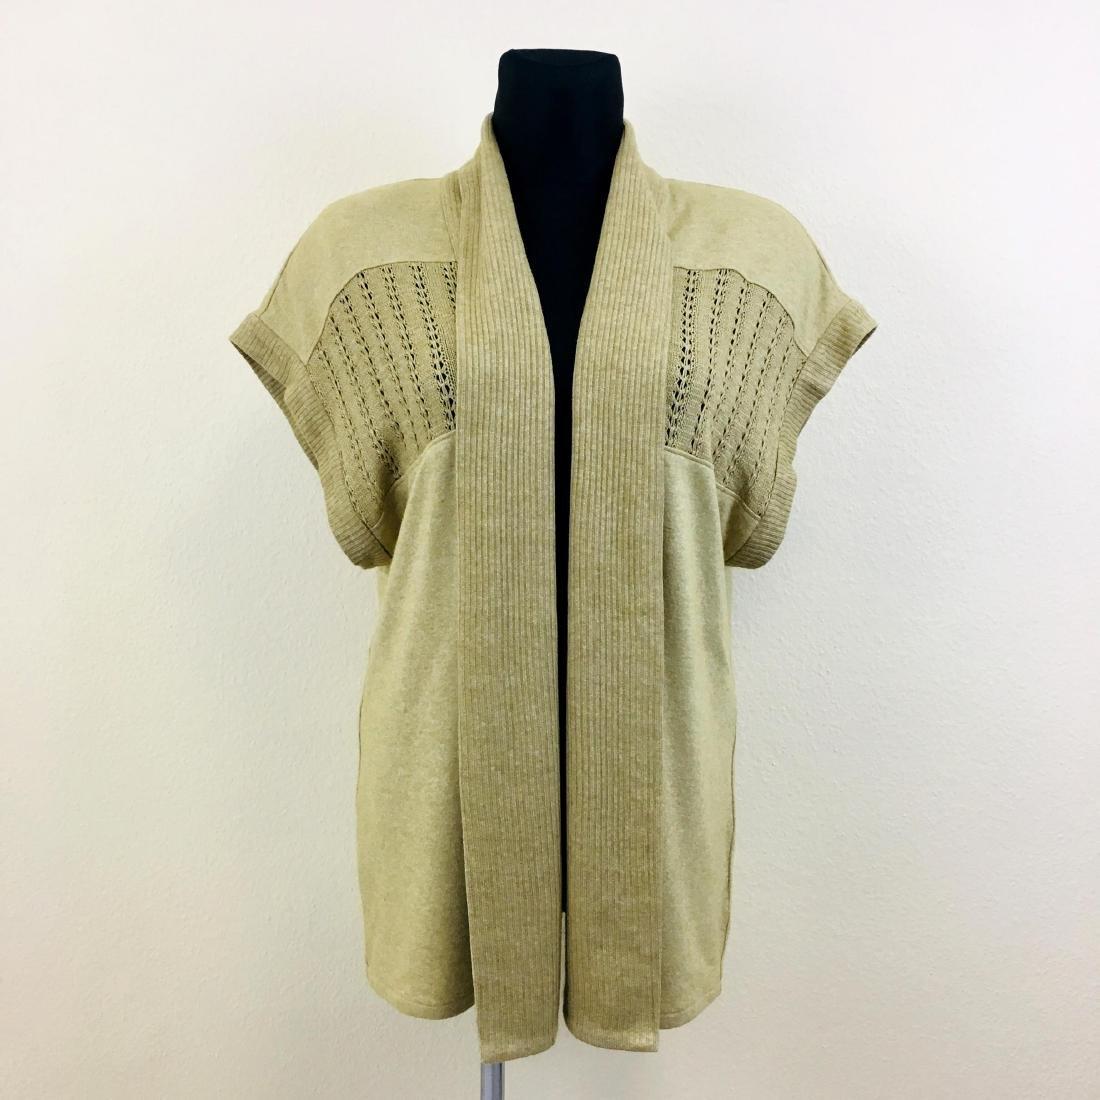 Women's Creation Charmante Wool Blend Cardigan Sweater